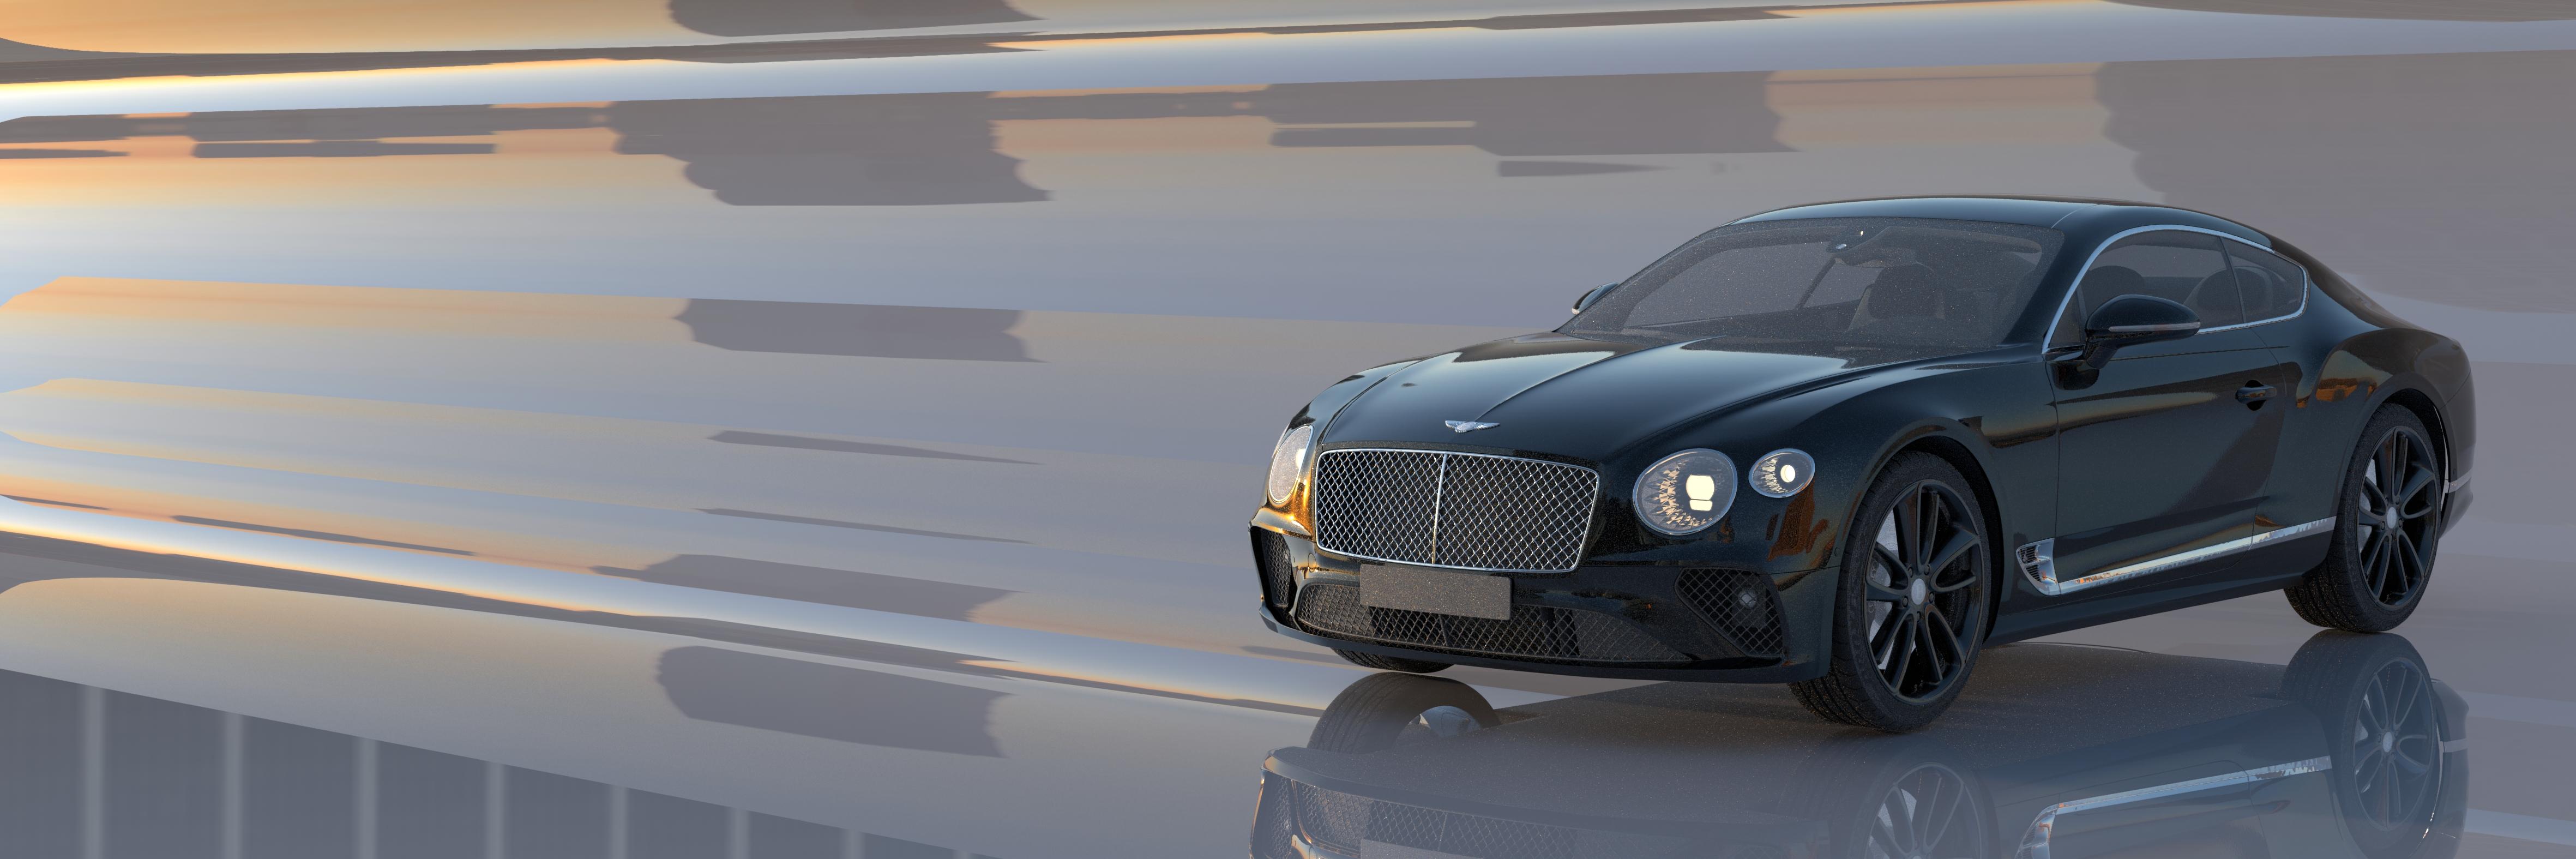 BentleyContinentalGT_hi-V1